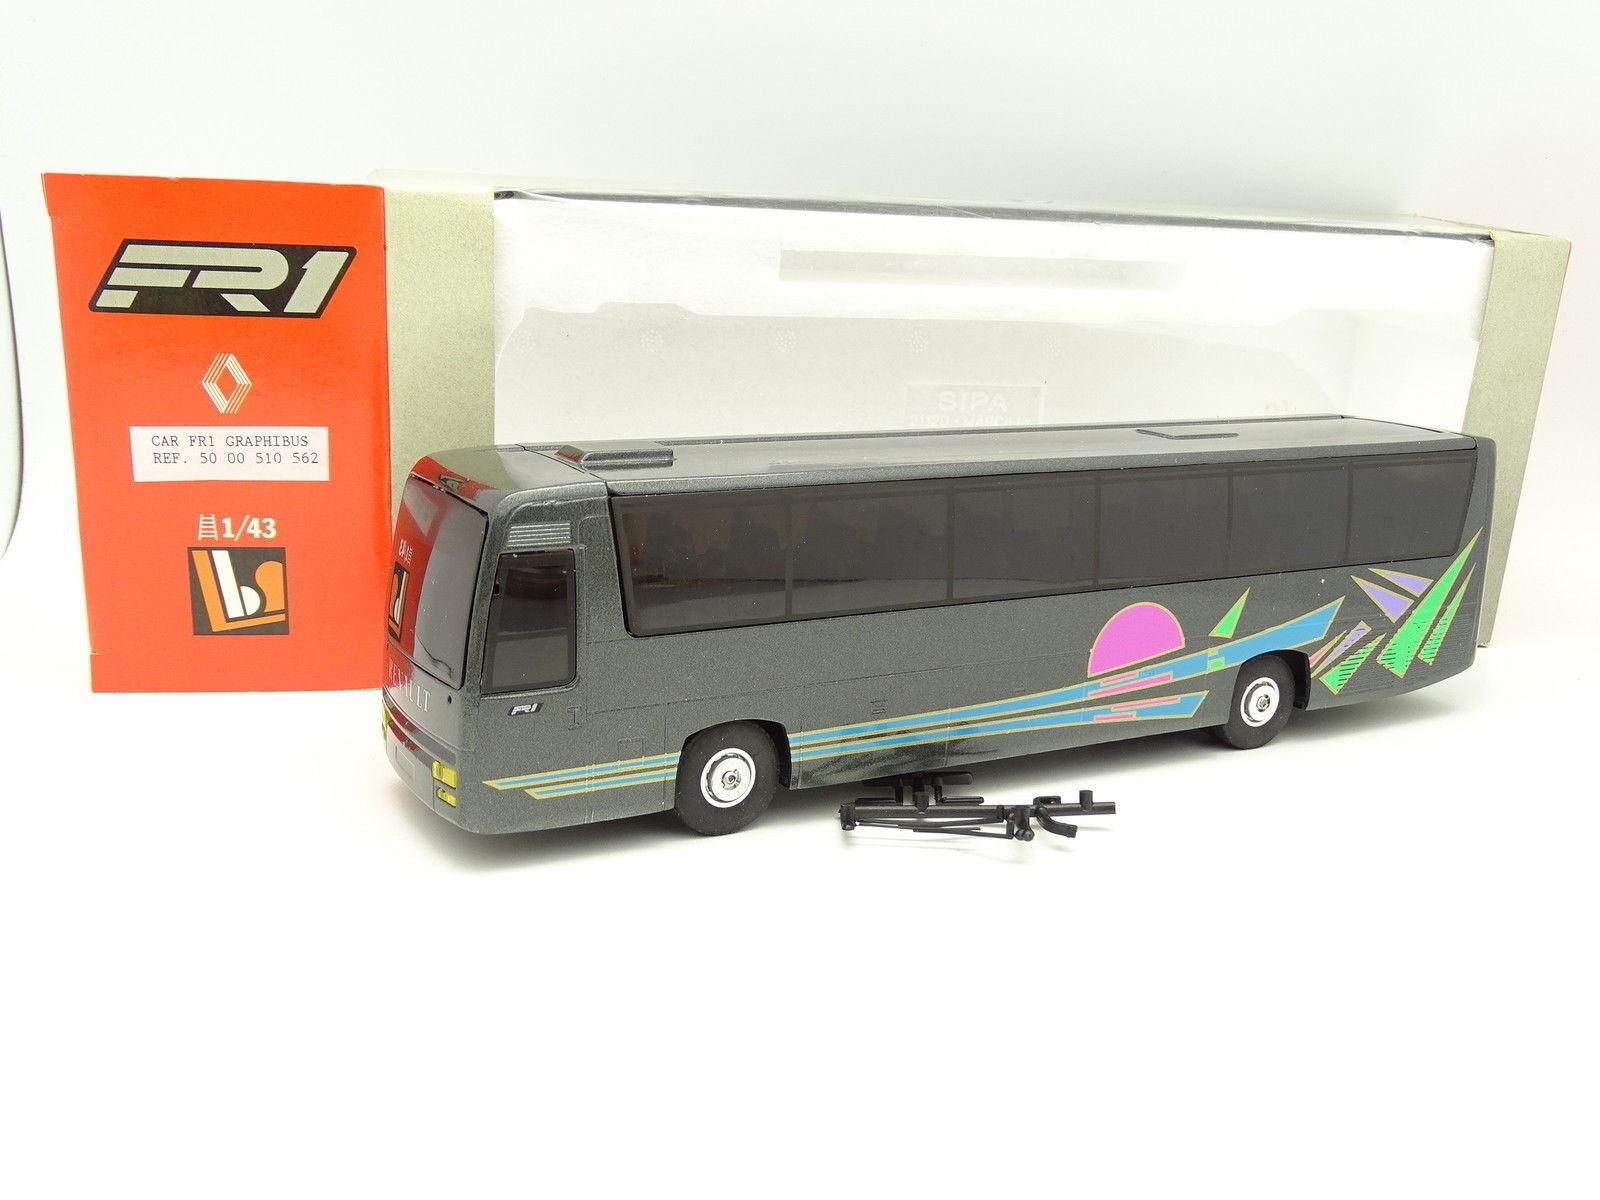 Eligor LBS 1 43 - Bus Car Autocar Renault FR1 Graphibus